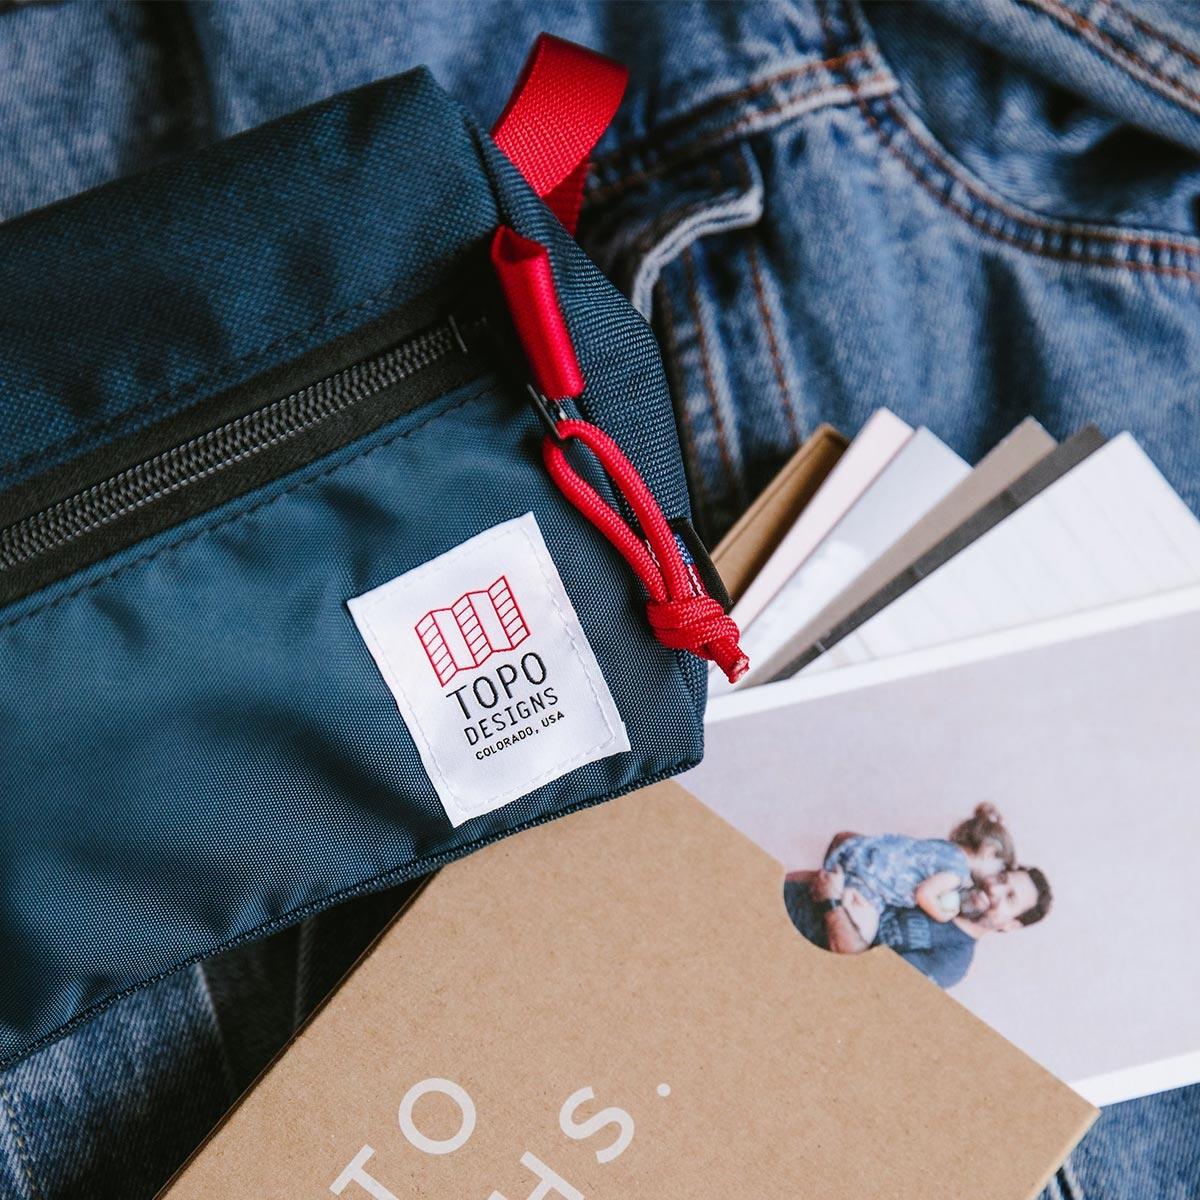 Topo Designs Dopp Kit Navy, water-resistant, travel light, accessory bag